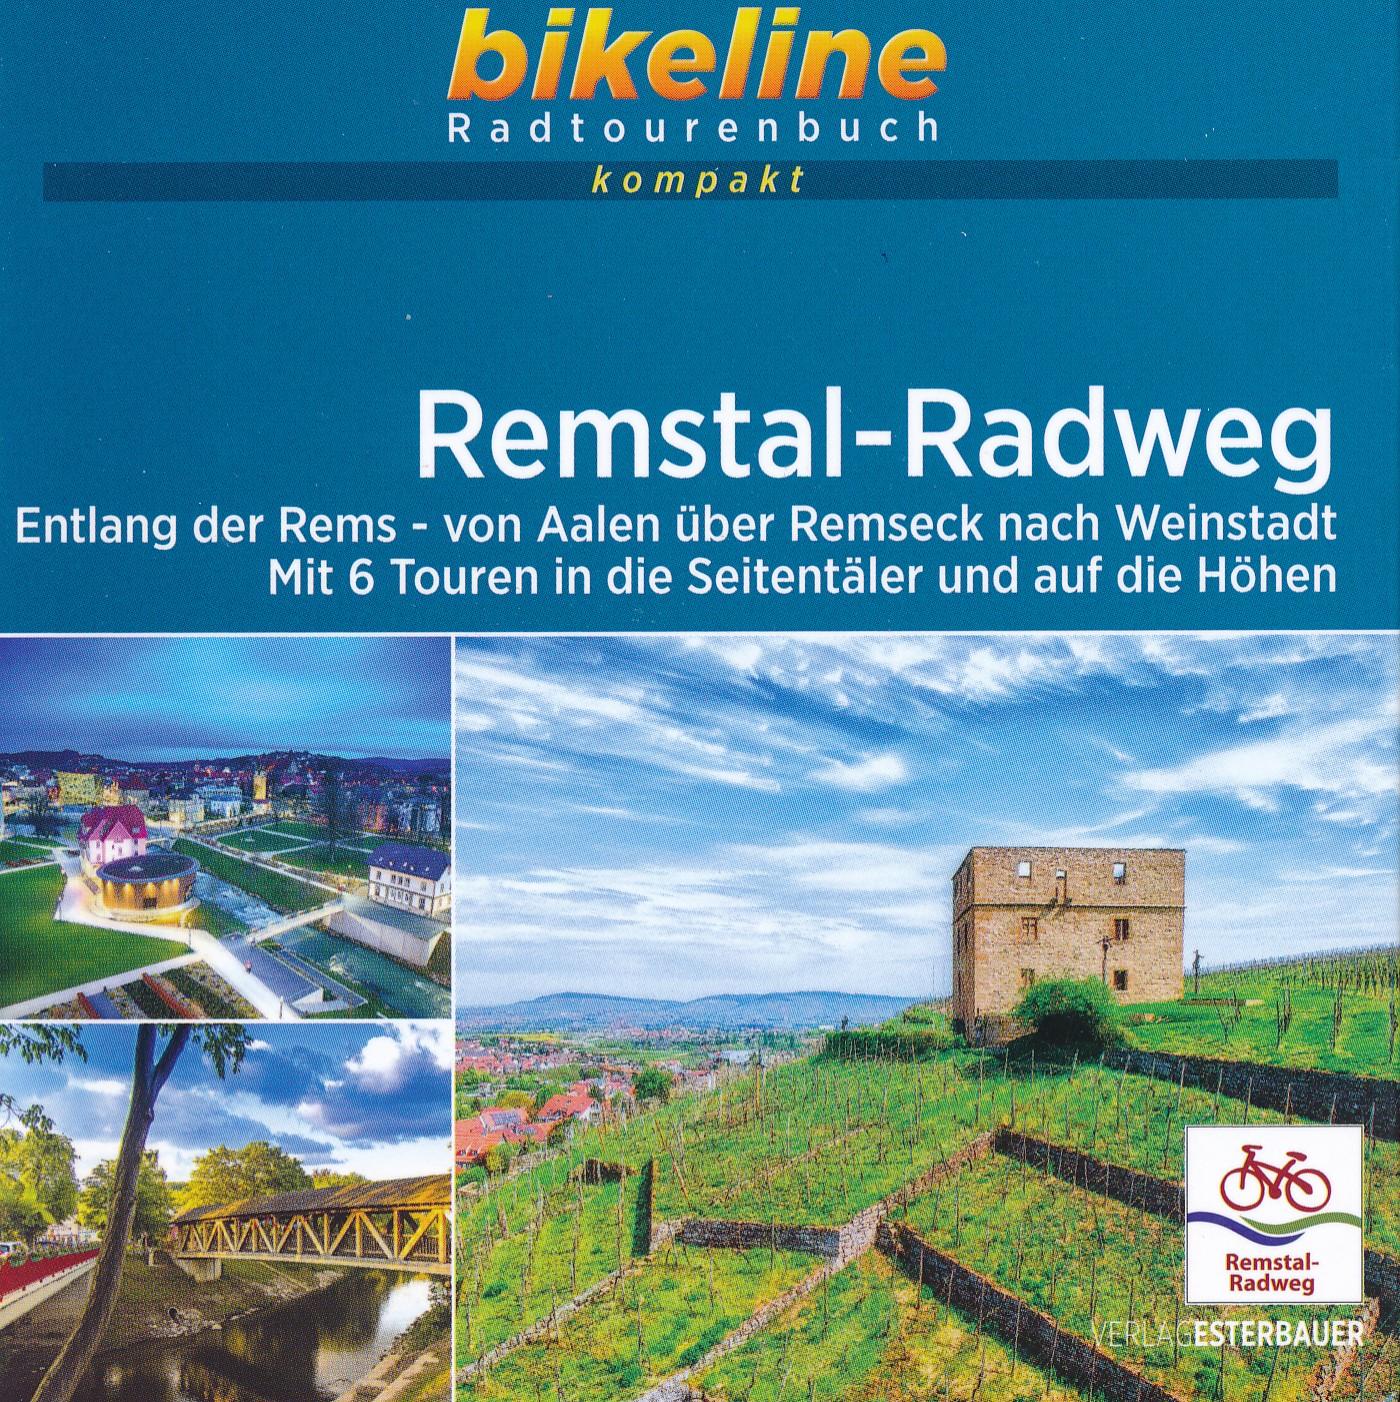 Fietsgids Bikeline Radtourenbuch kompakt Remstal-Radweg | Esterbauer de zwerver